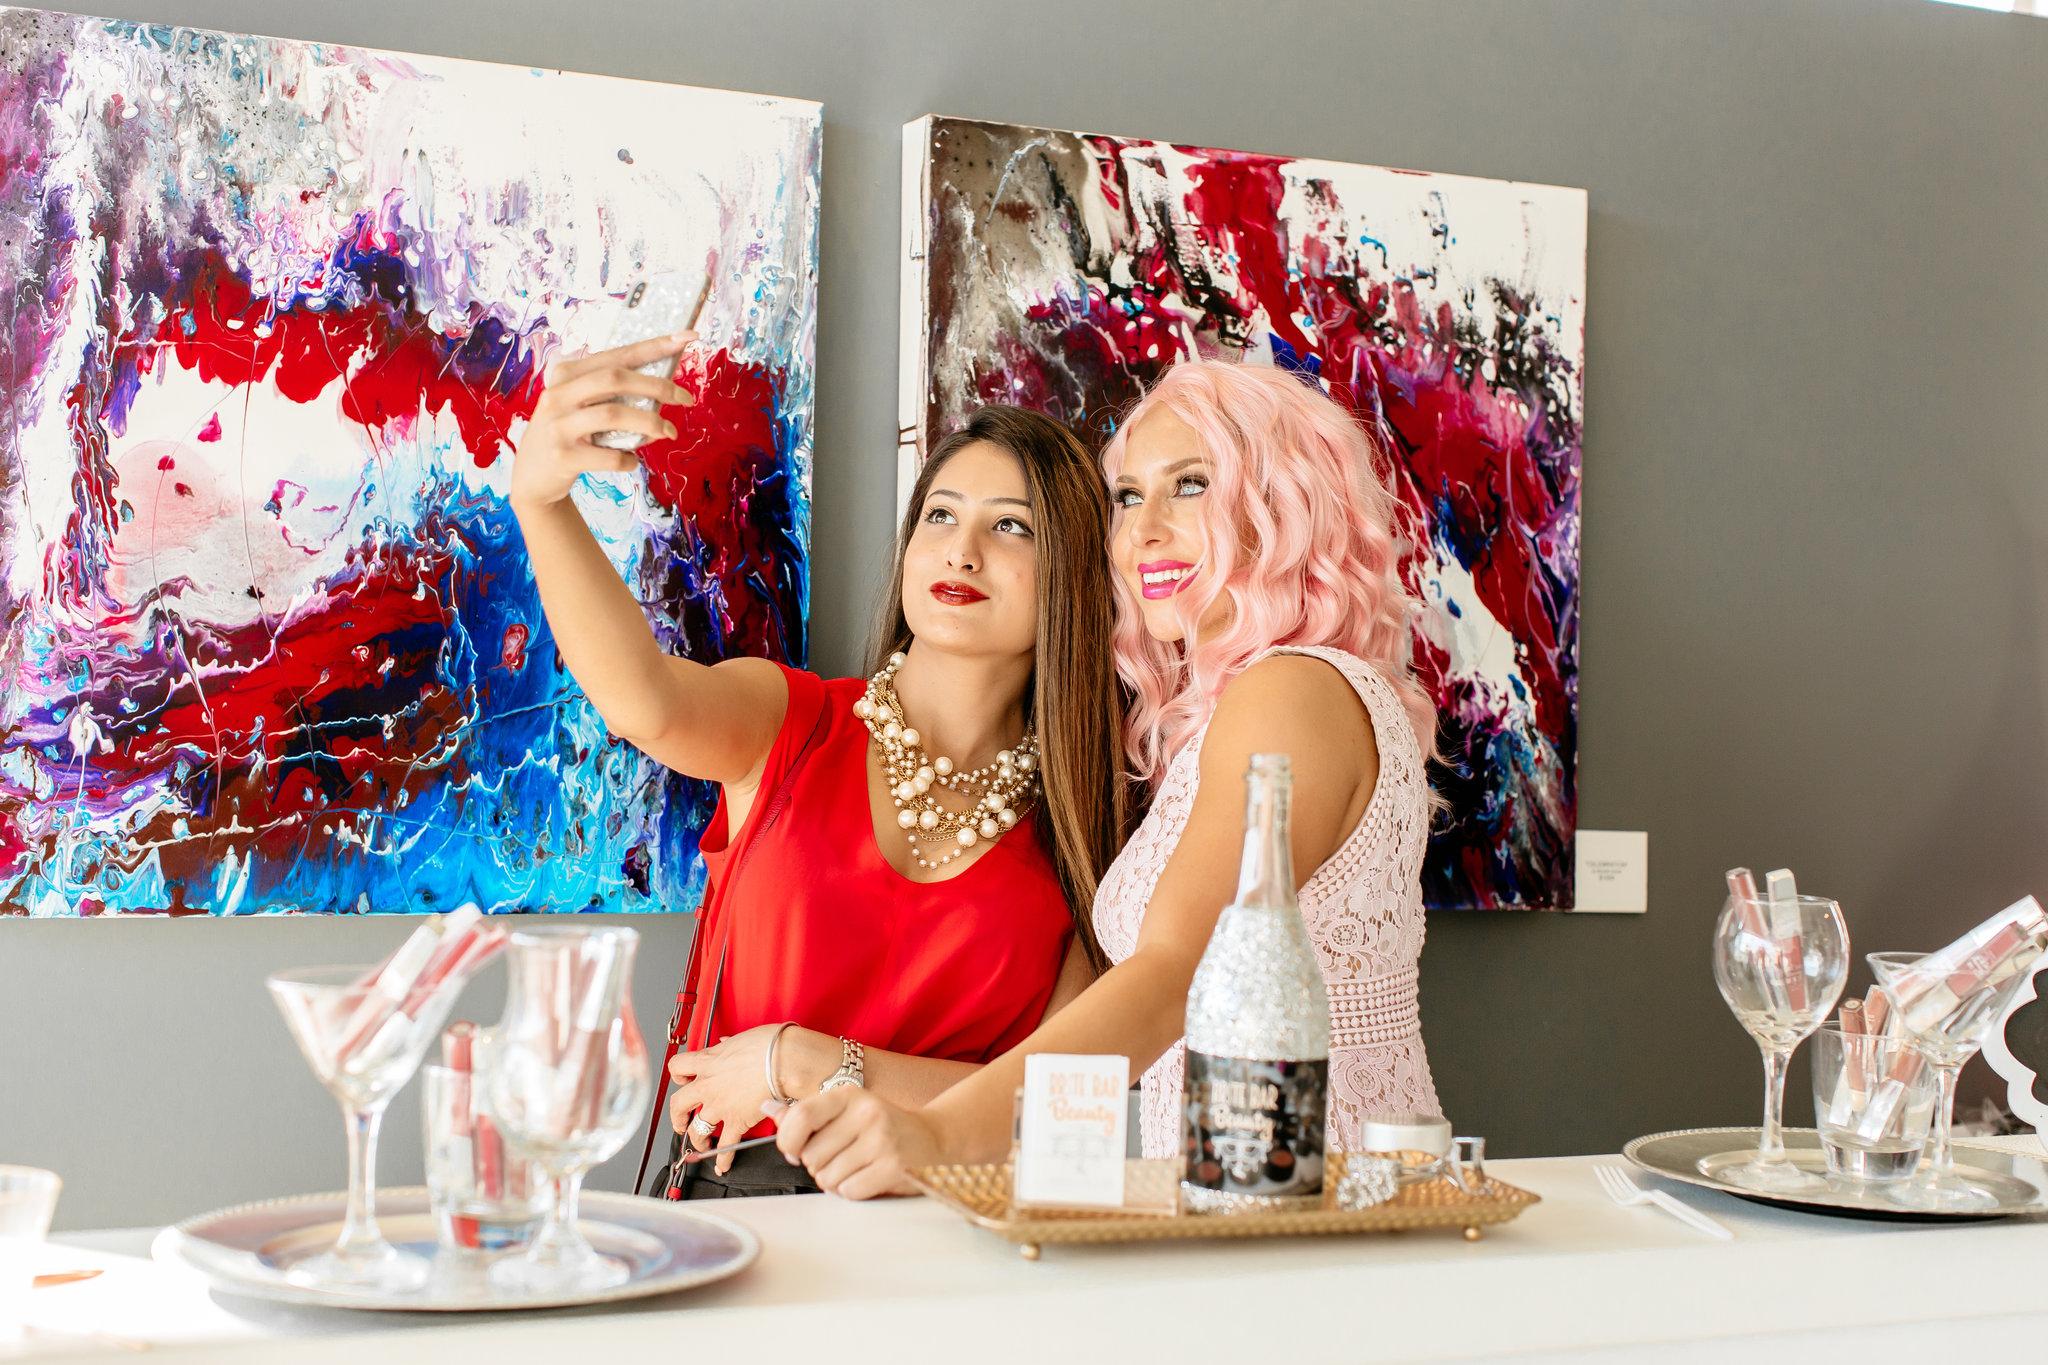 Alexa-Vossler-Photo_Dallas-Event-Photographer_Brite-Bar-Beauty-2018-Lipstick-Launch-Party-68.jpg